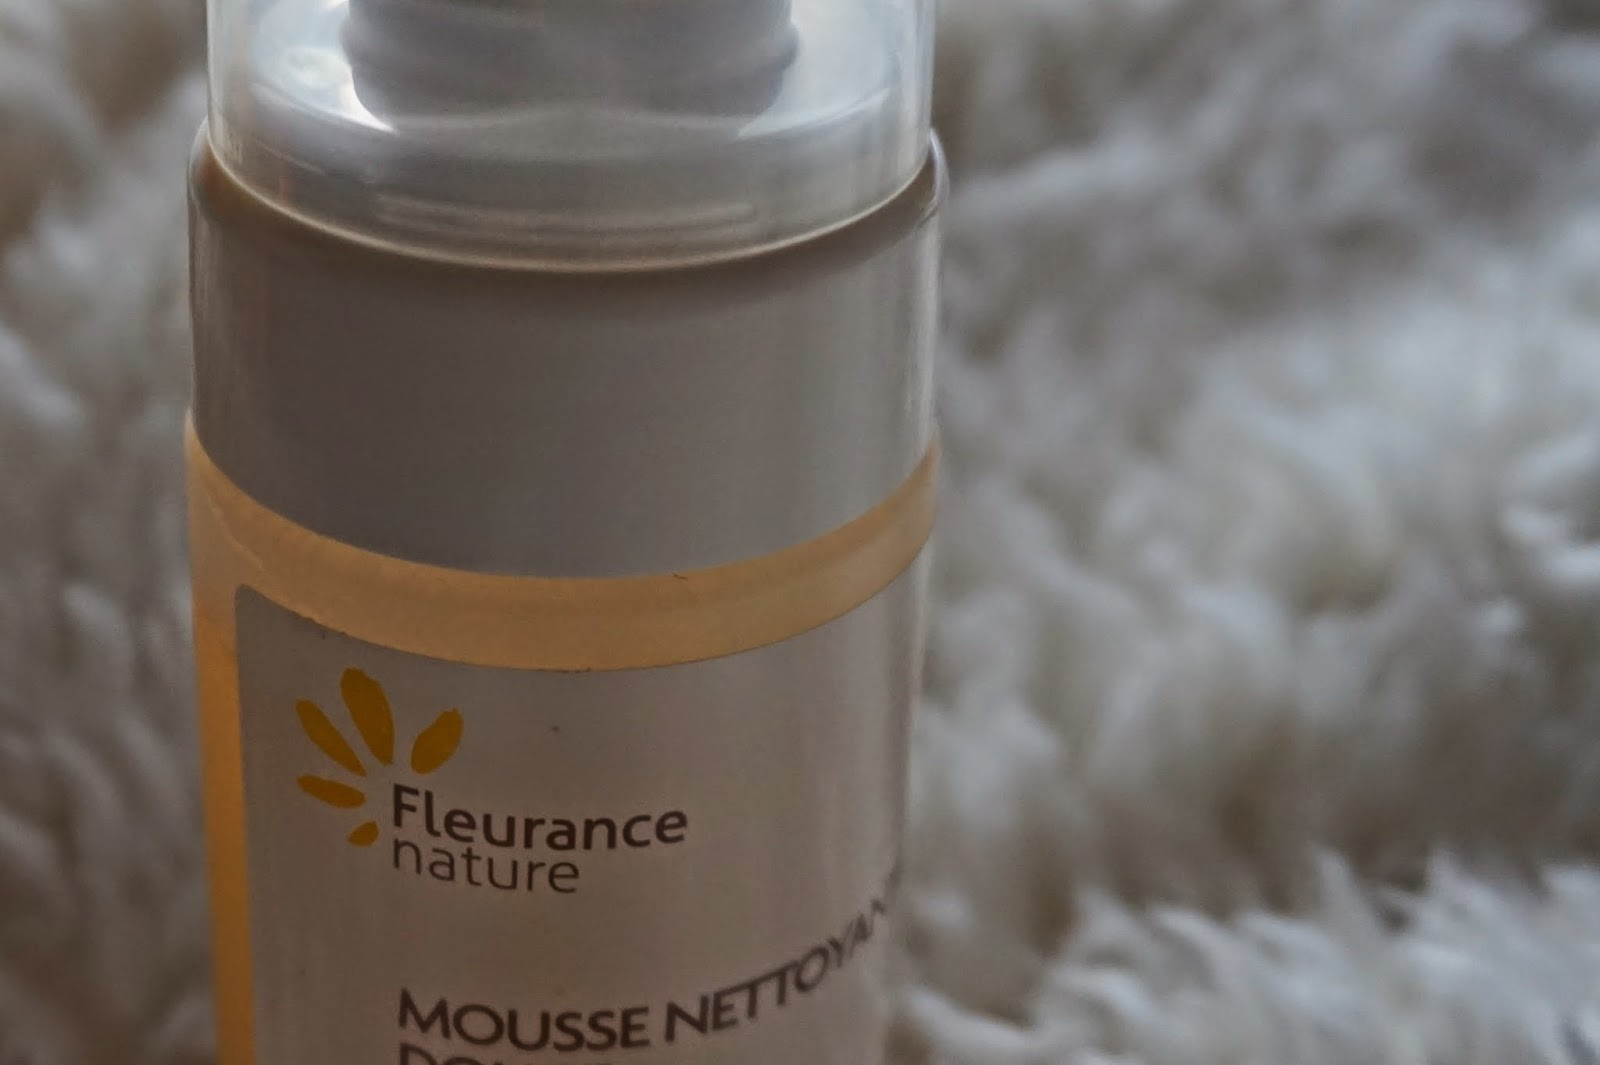 Flavour beans foam everywhere mousse nettoyante douce for Fleurance nature